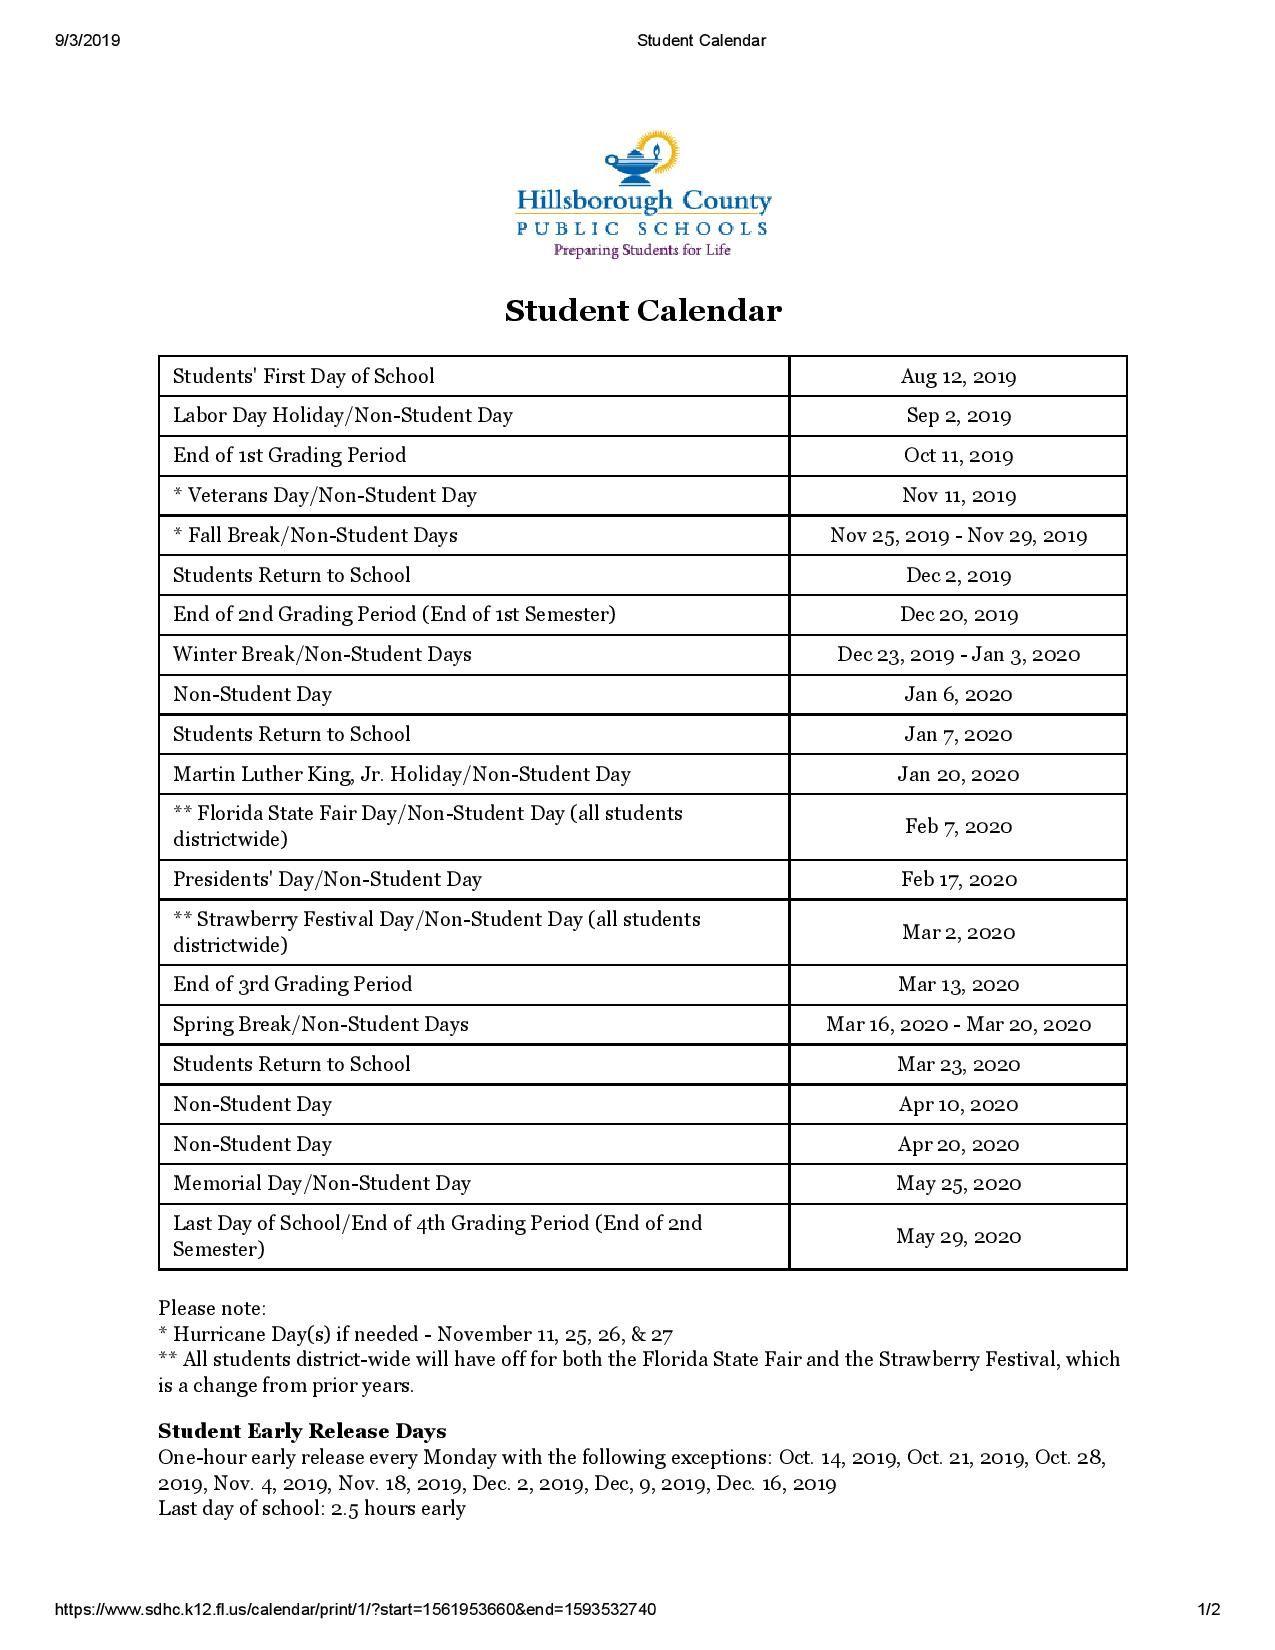 Hillsborough County School Calendar School Calendar Student